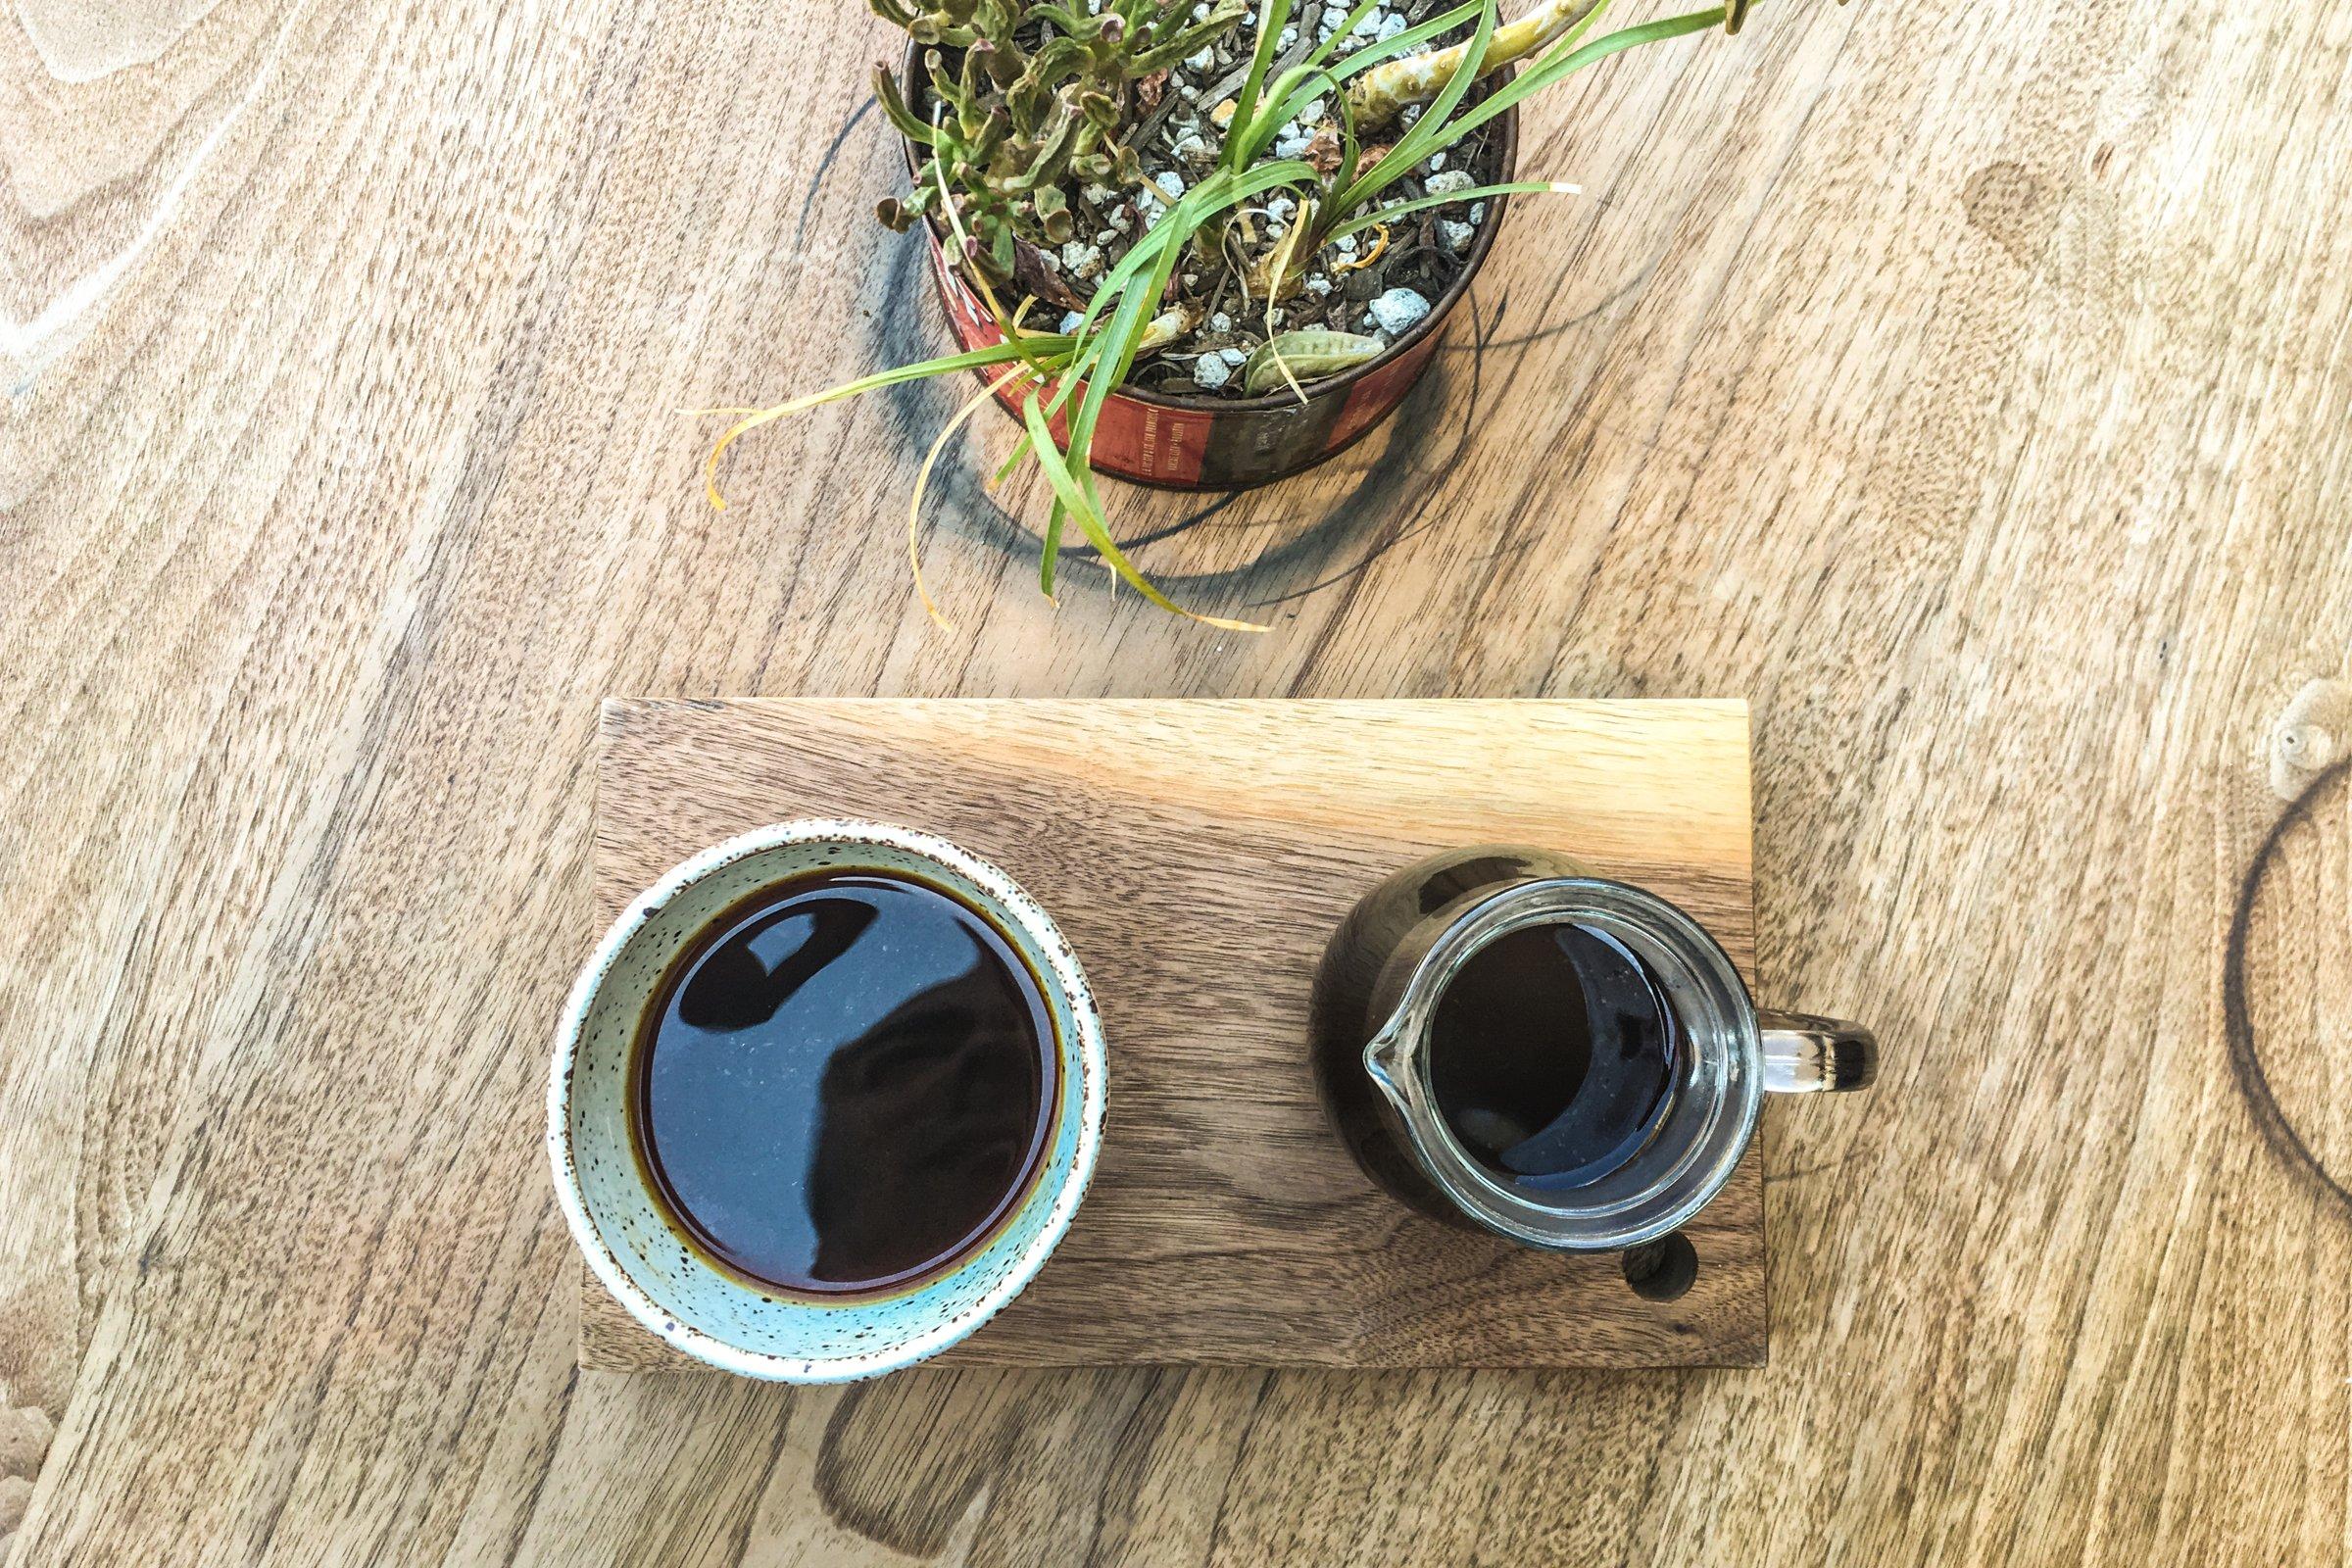 Coffee Cup & Mug on Wood Table